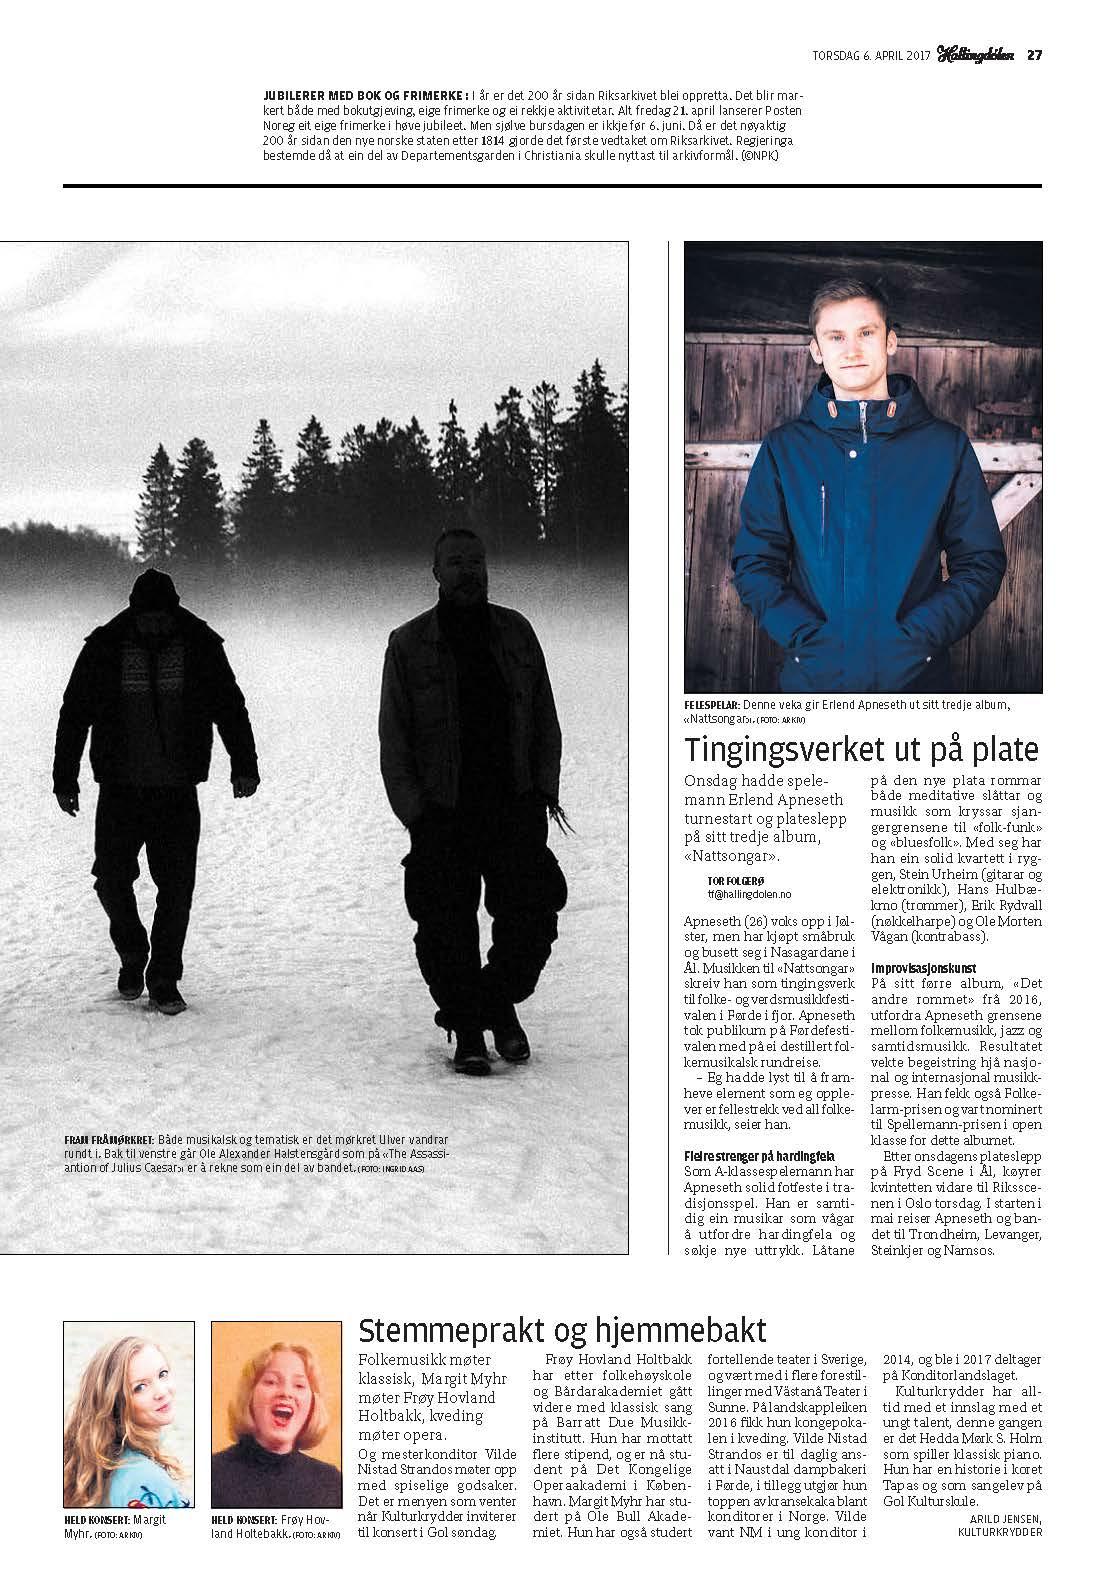 Hallingdølen-2017-04-06-Erlend Apneseth tingingsverk til plate - side-27.jpg